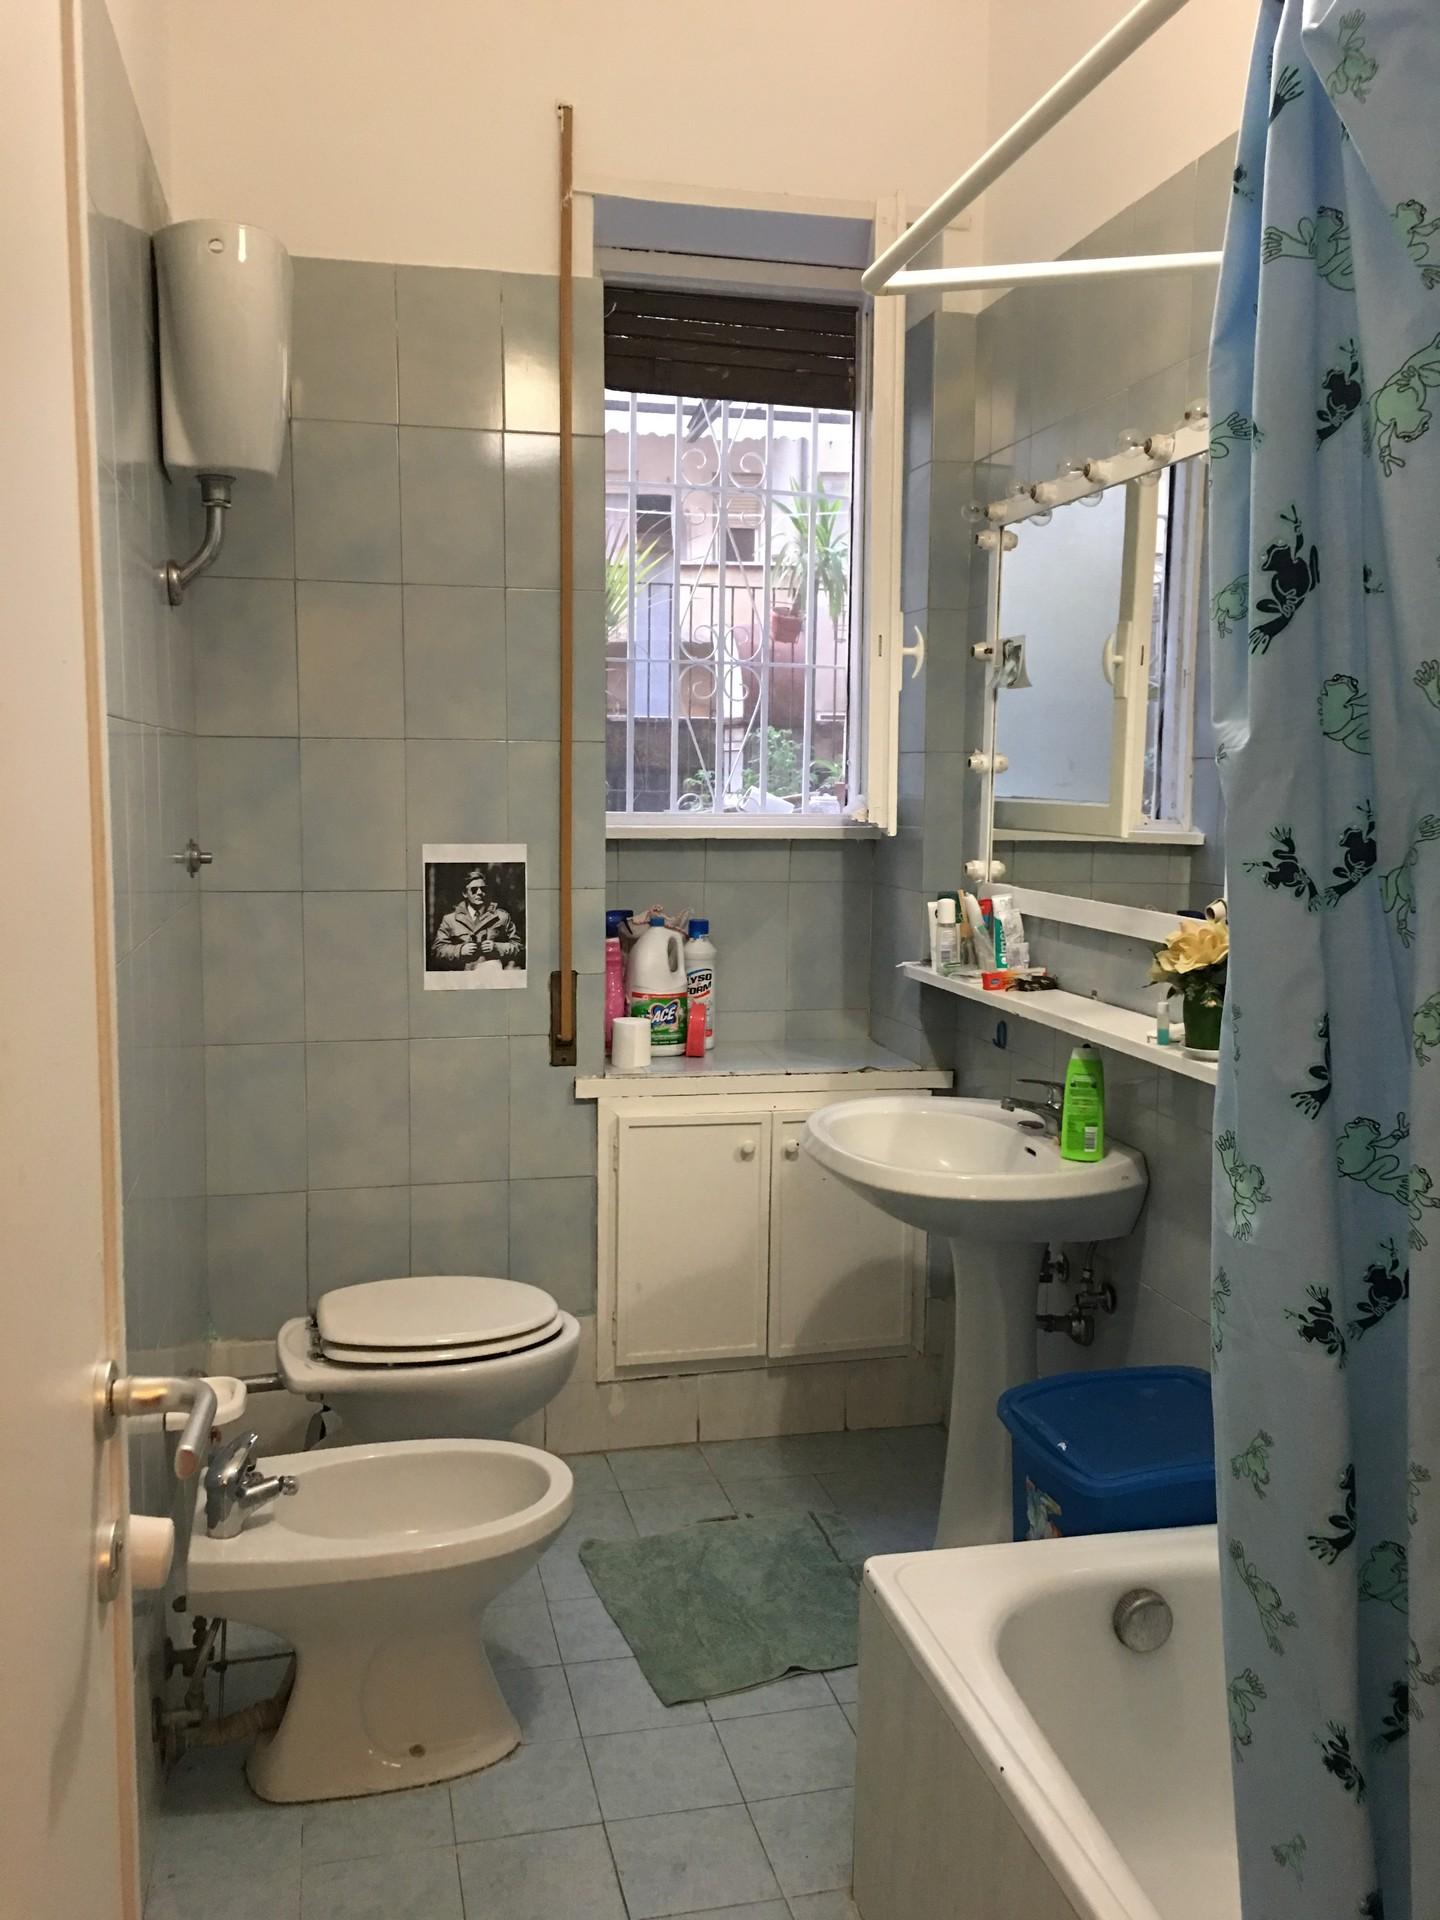 camere-appartamento-a7383b197c0df703a8fd